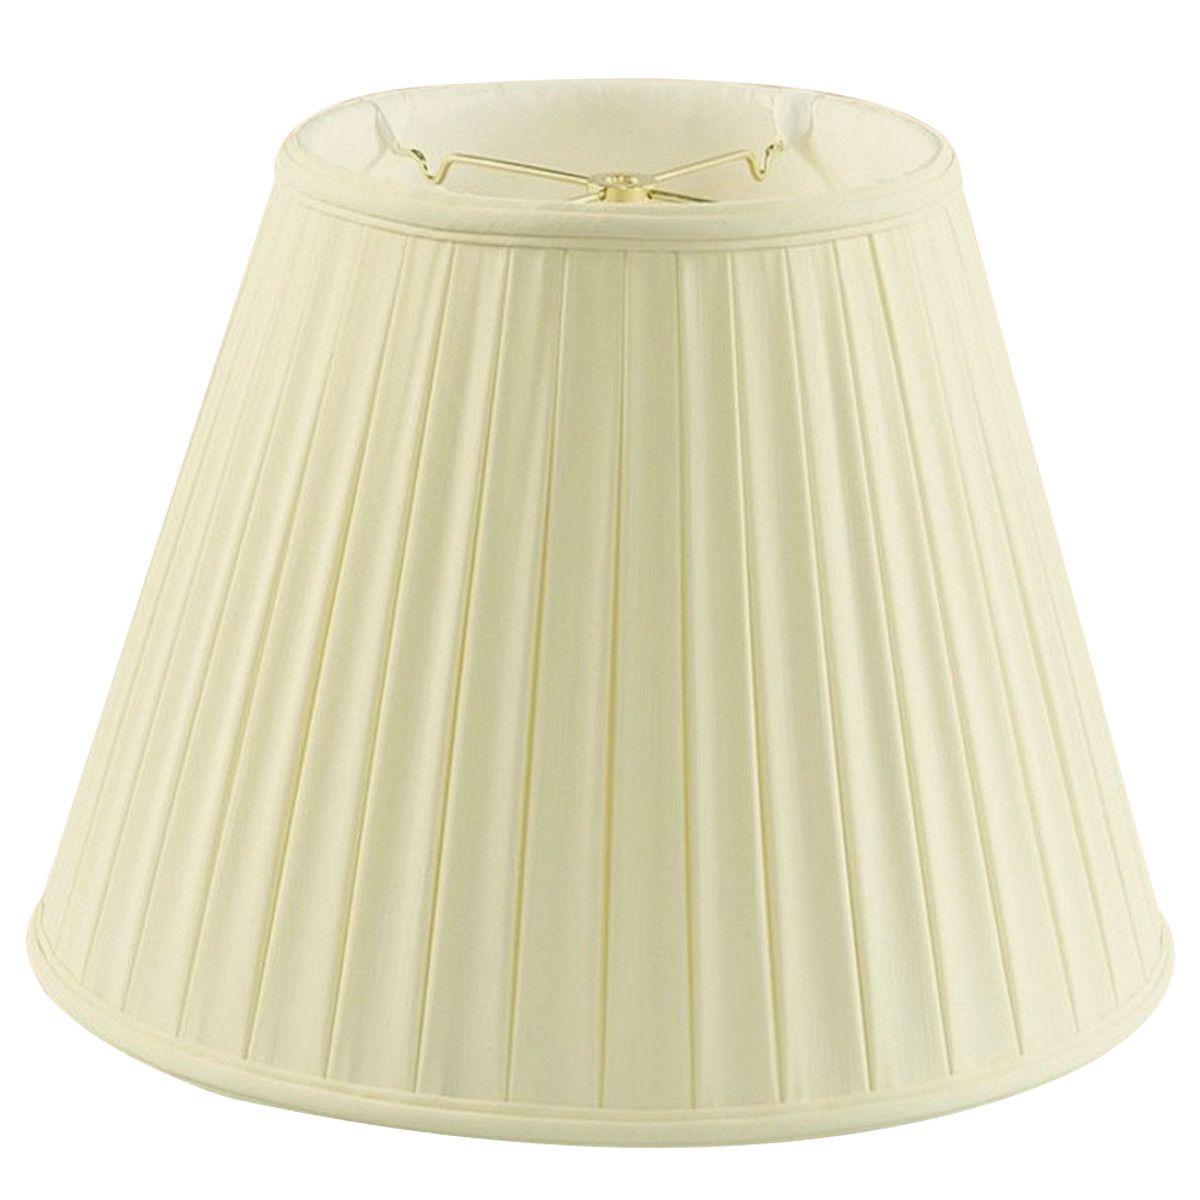 Home Concept Inc 18'' Classics Box Pleat Deluxe Shantung Empire Lamp Shade